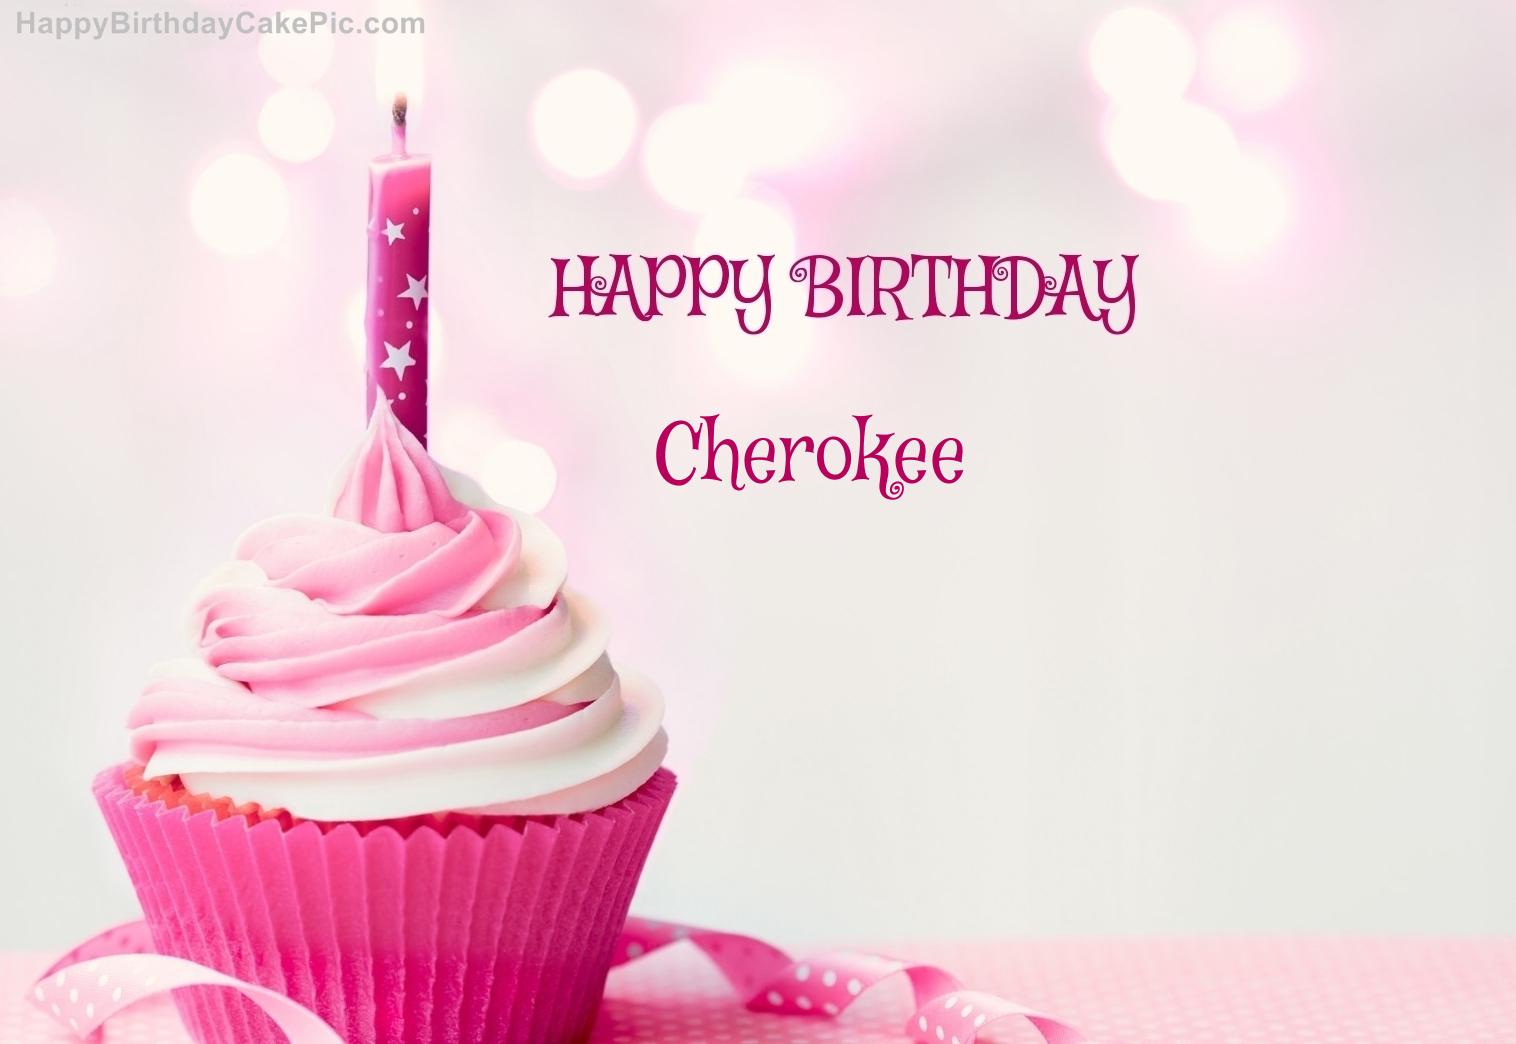 Happy birthday in cherokee